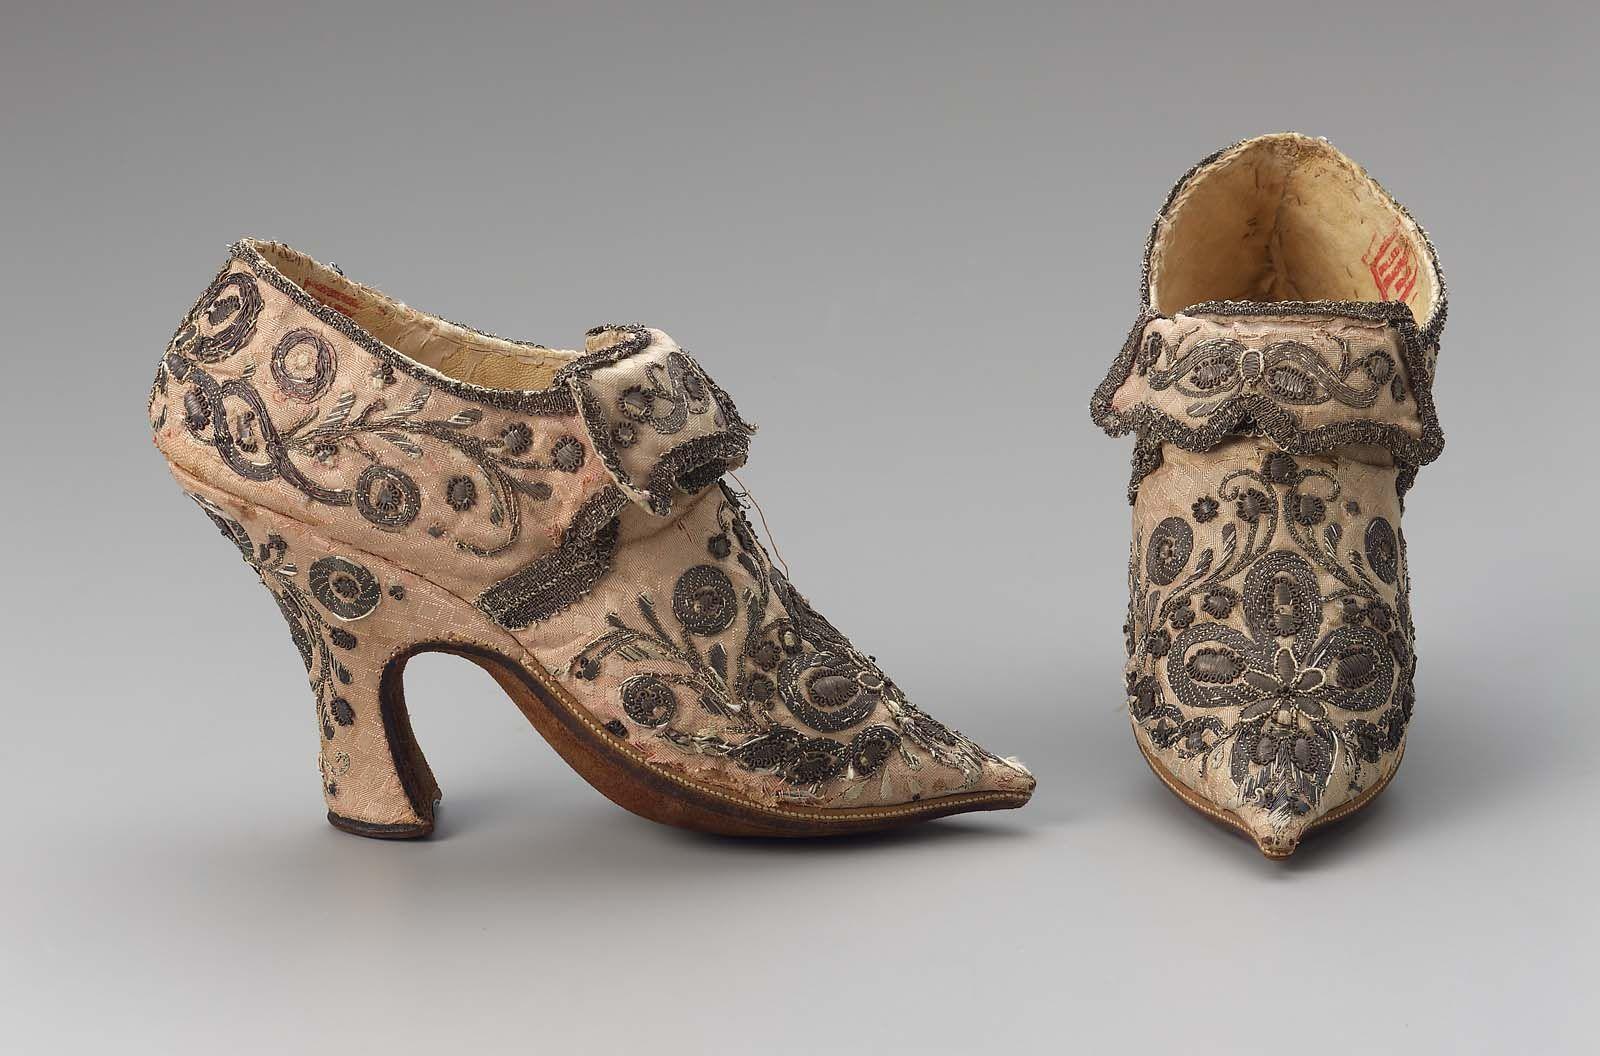 Pair Of Women S Shoes Historical Shoes Women Shoes Vintage Shoes